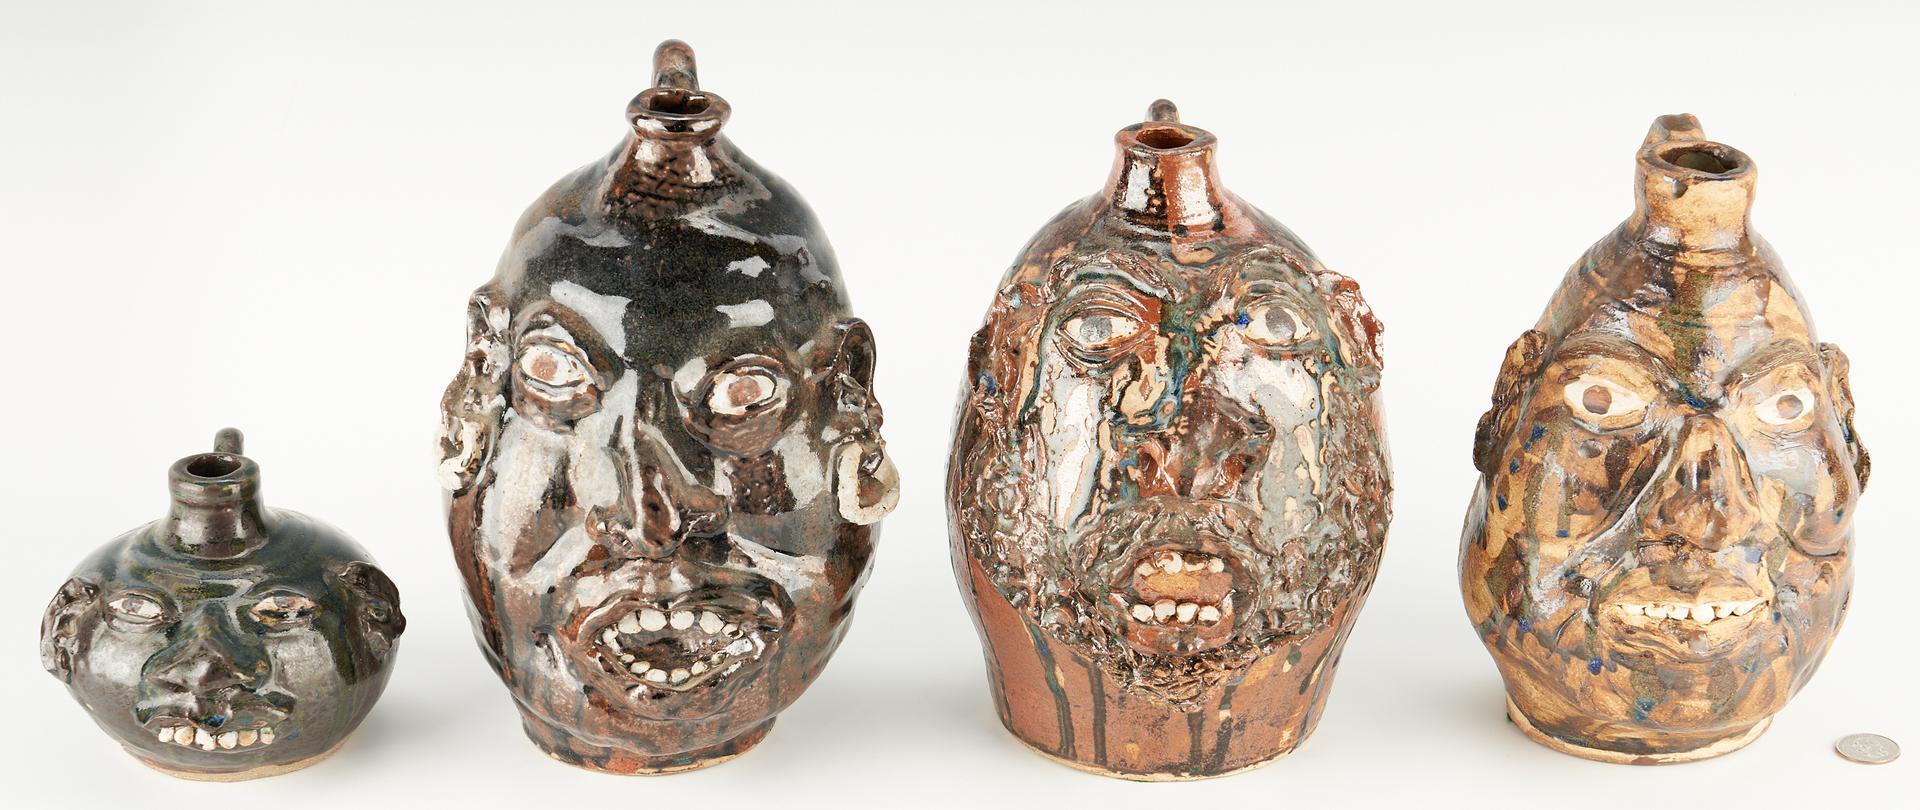 Lot 1042: 4 Tennessee Folk Art Pottery Face Jugs, Betty Jo Cabe